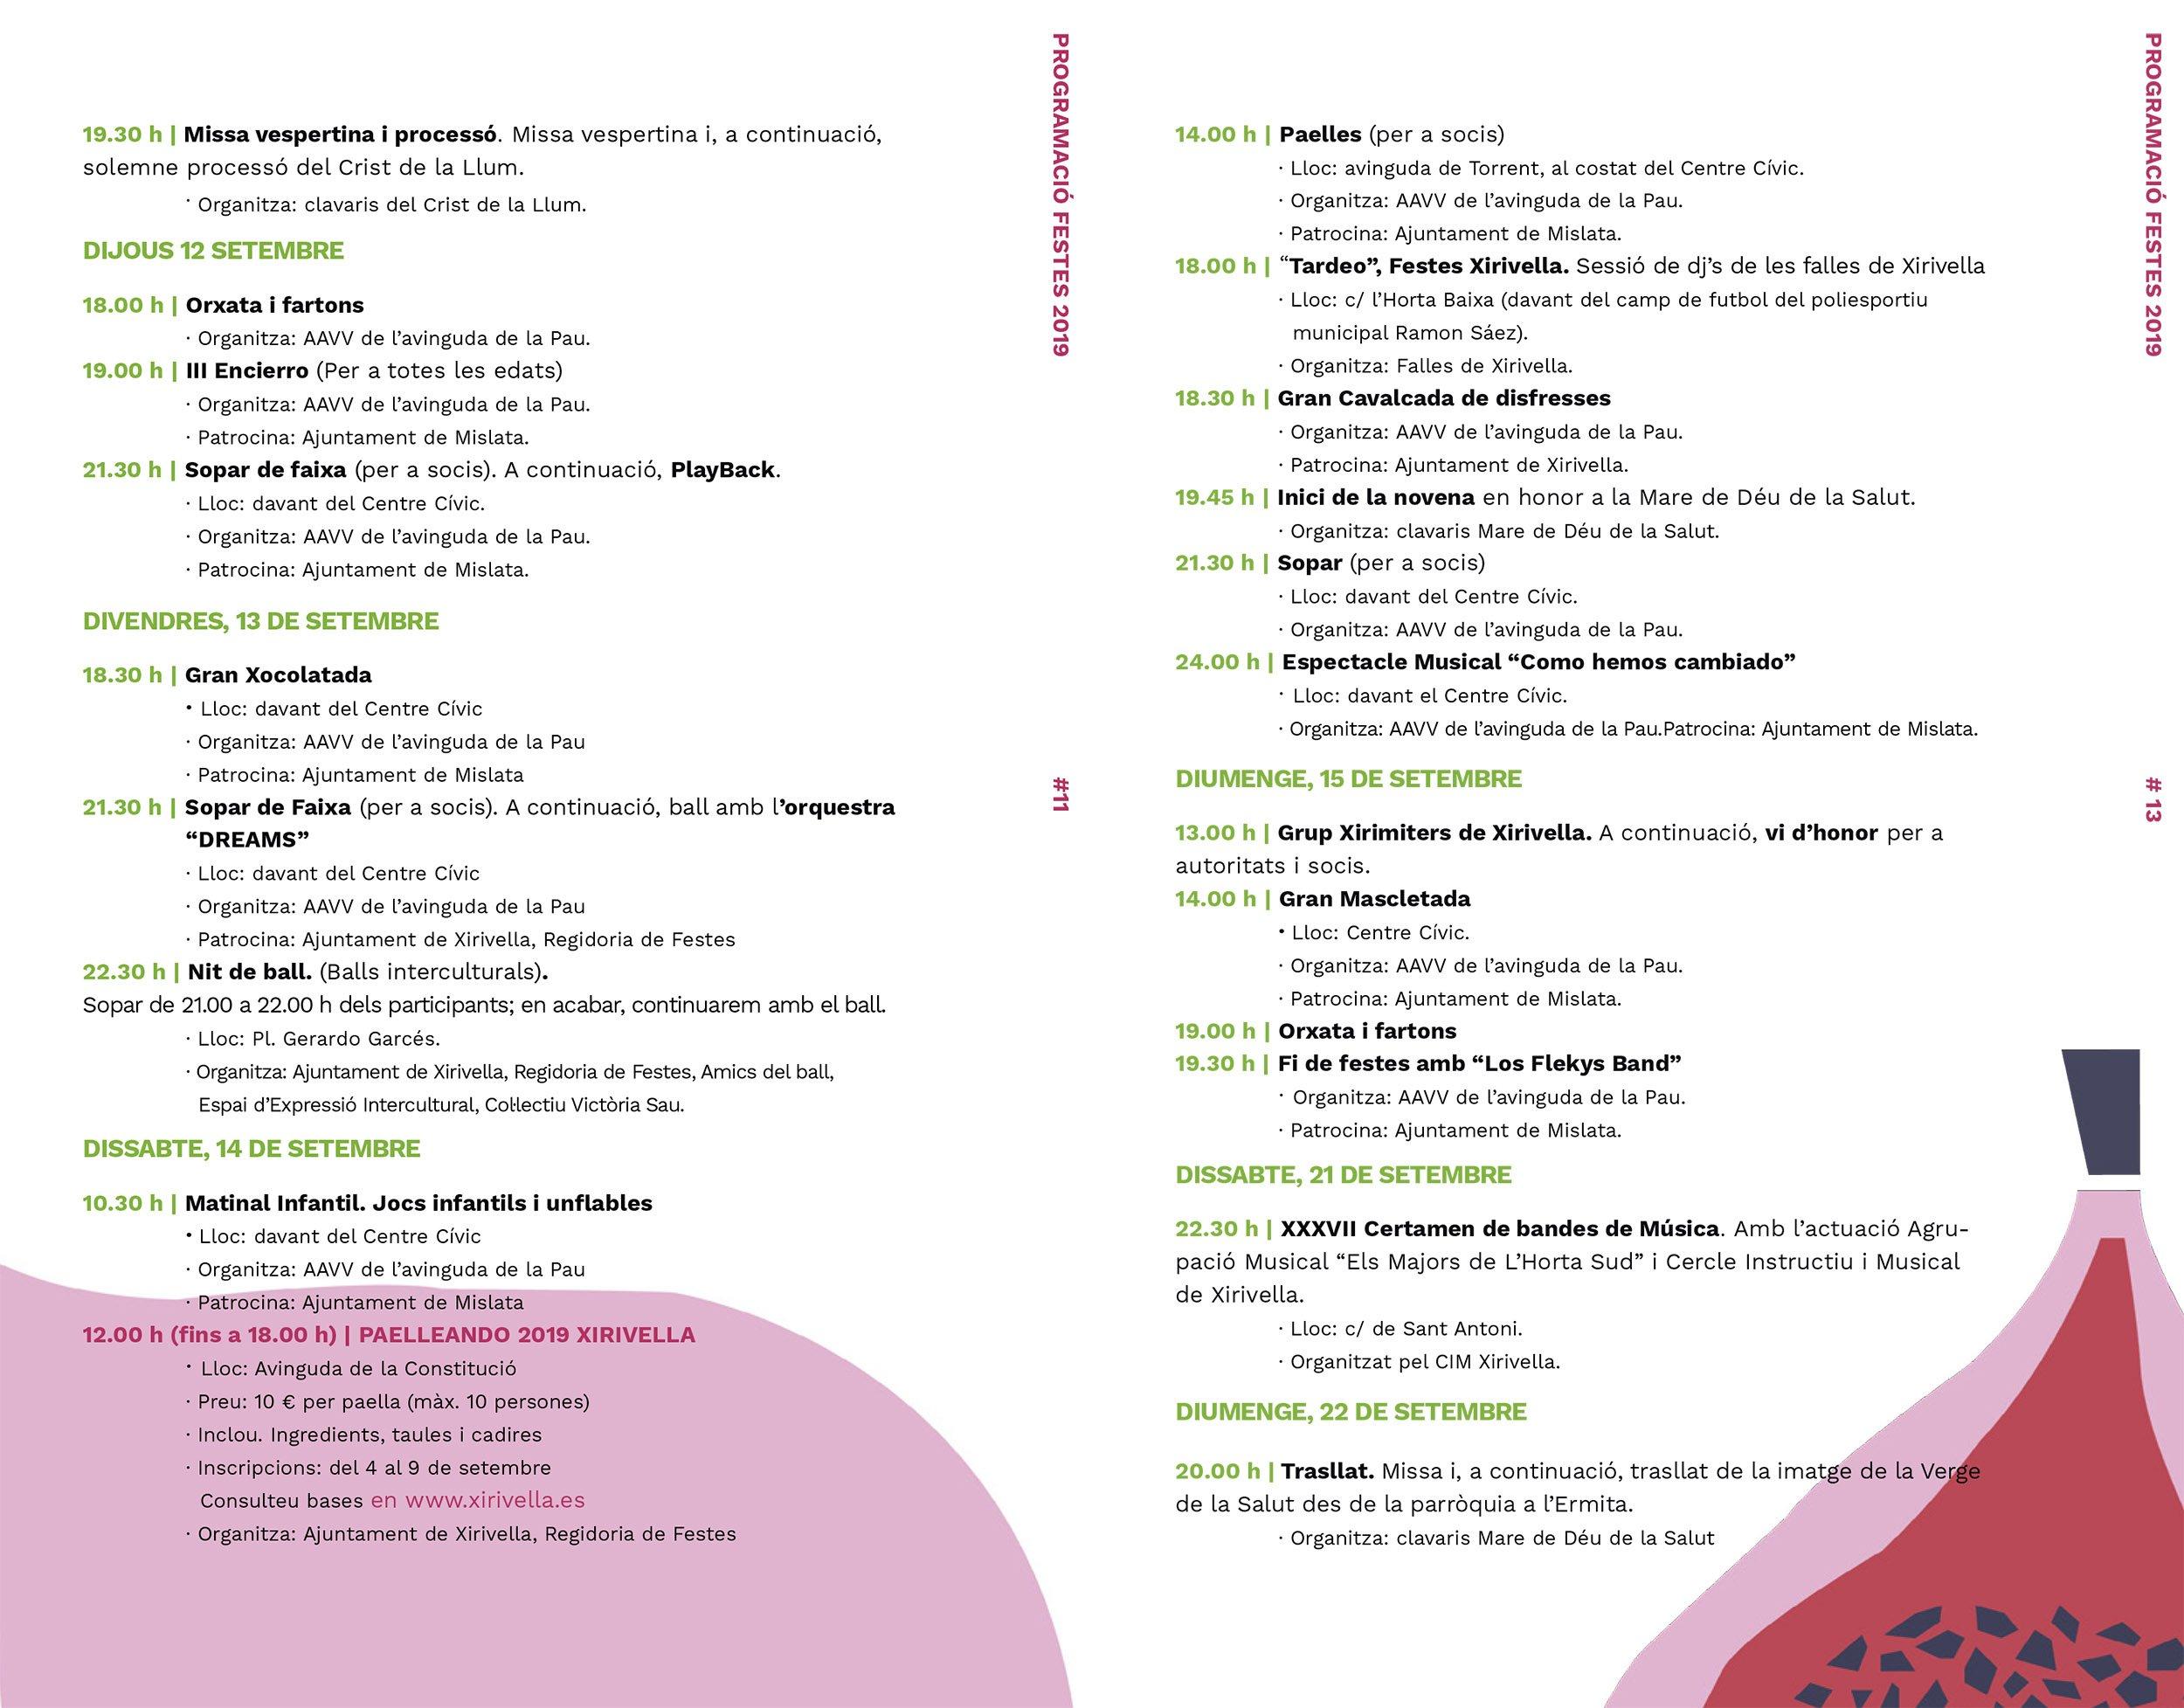 Fiestas Xirivella 2019 Programacion 4